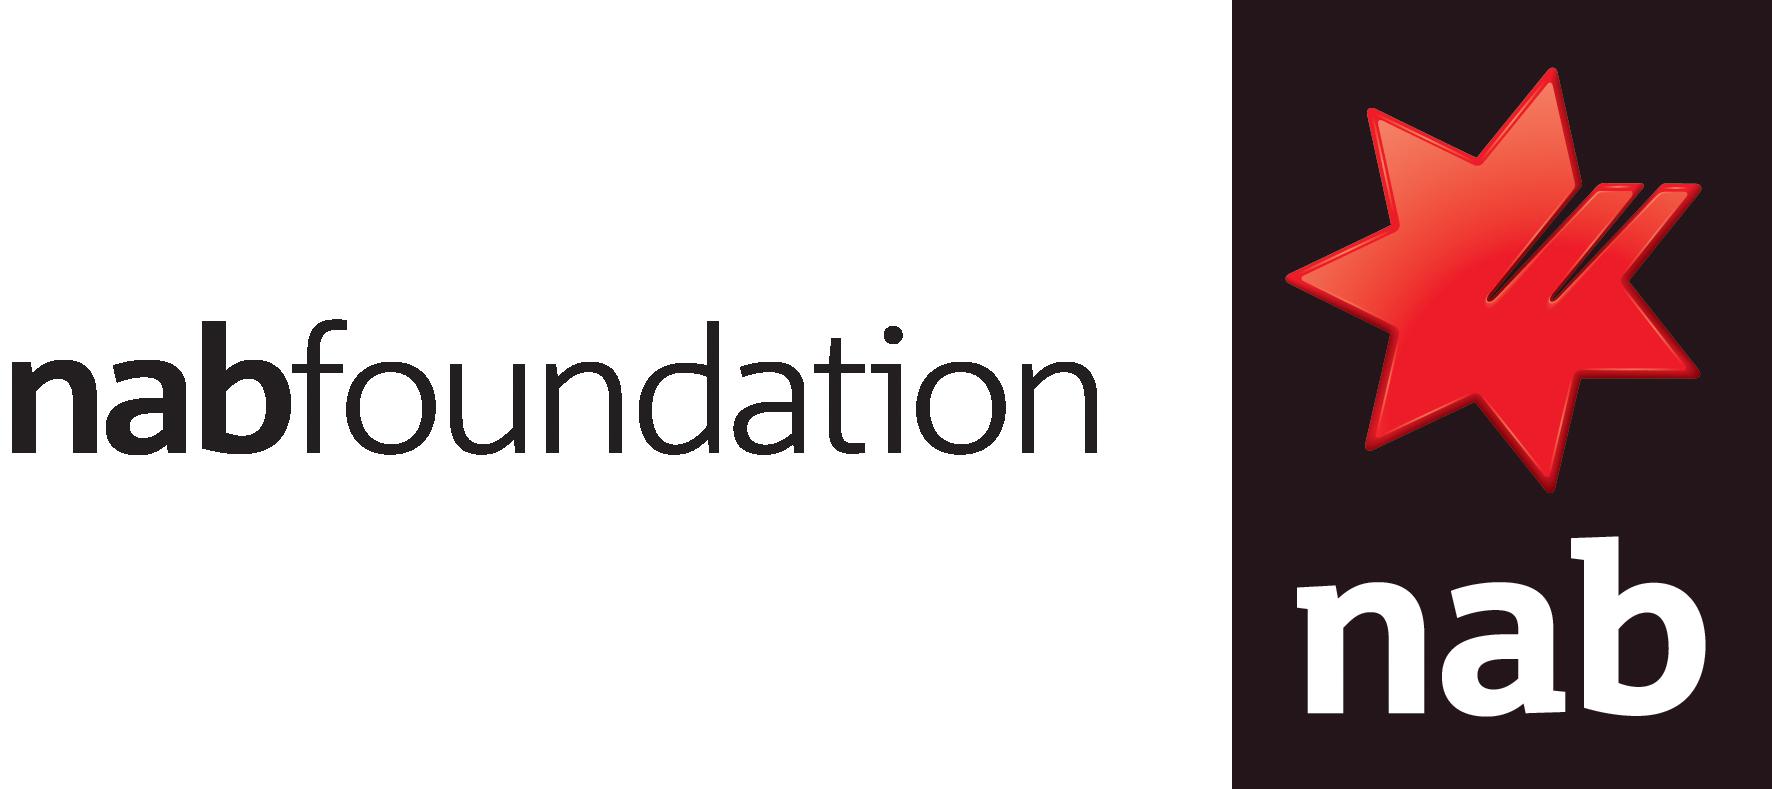 NAB_foundation_lockup_regular.png